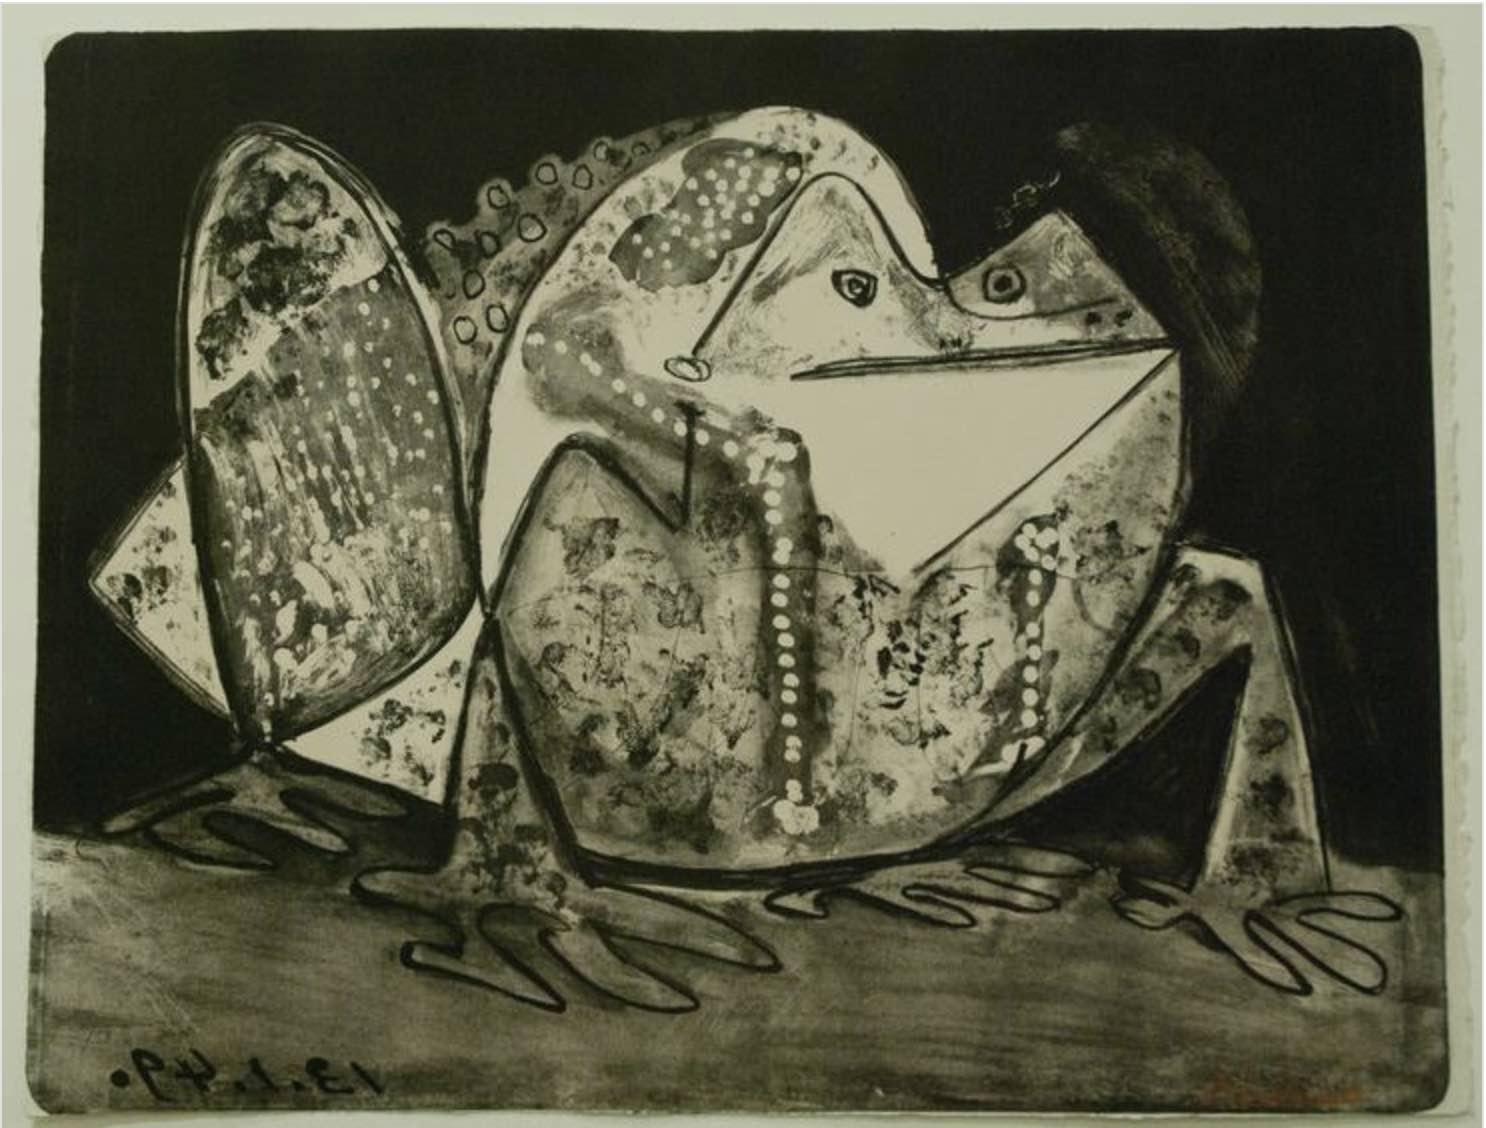 Le crapaud, de Pablo Picasso